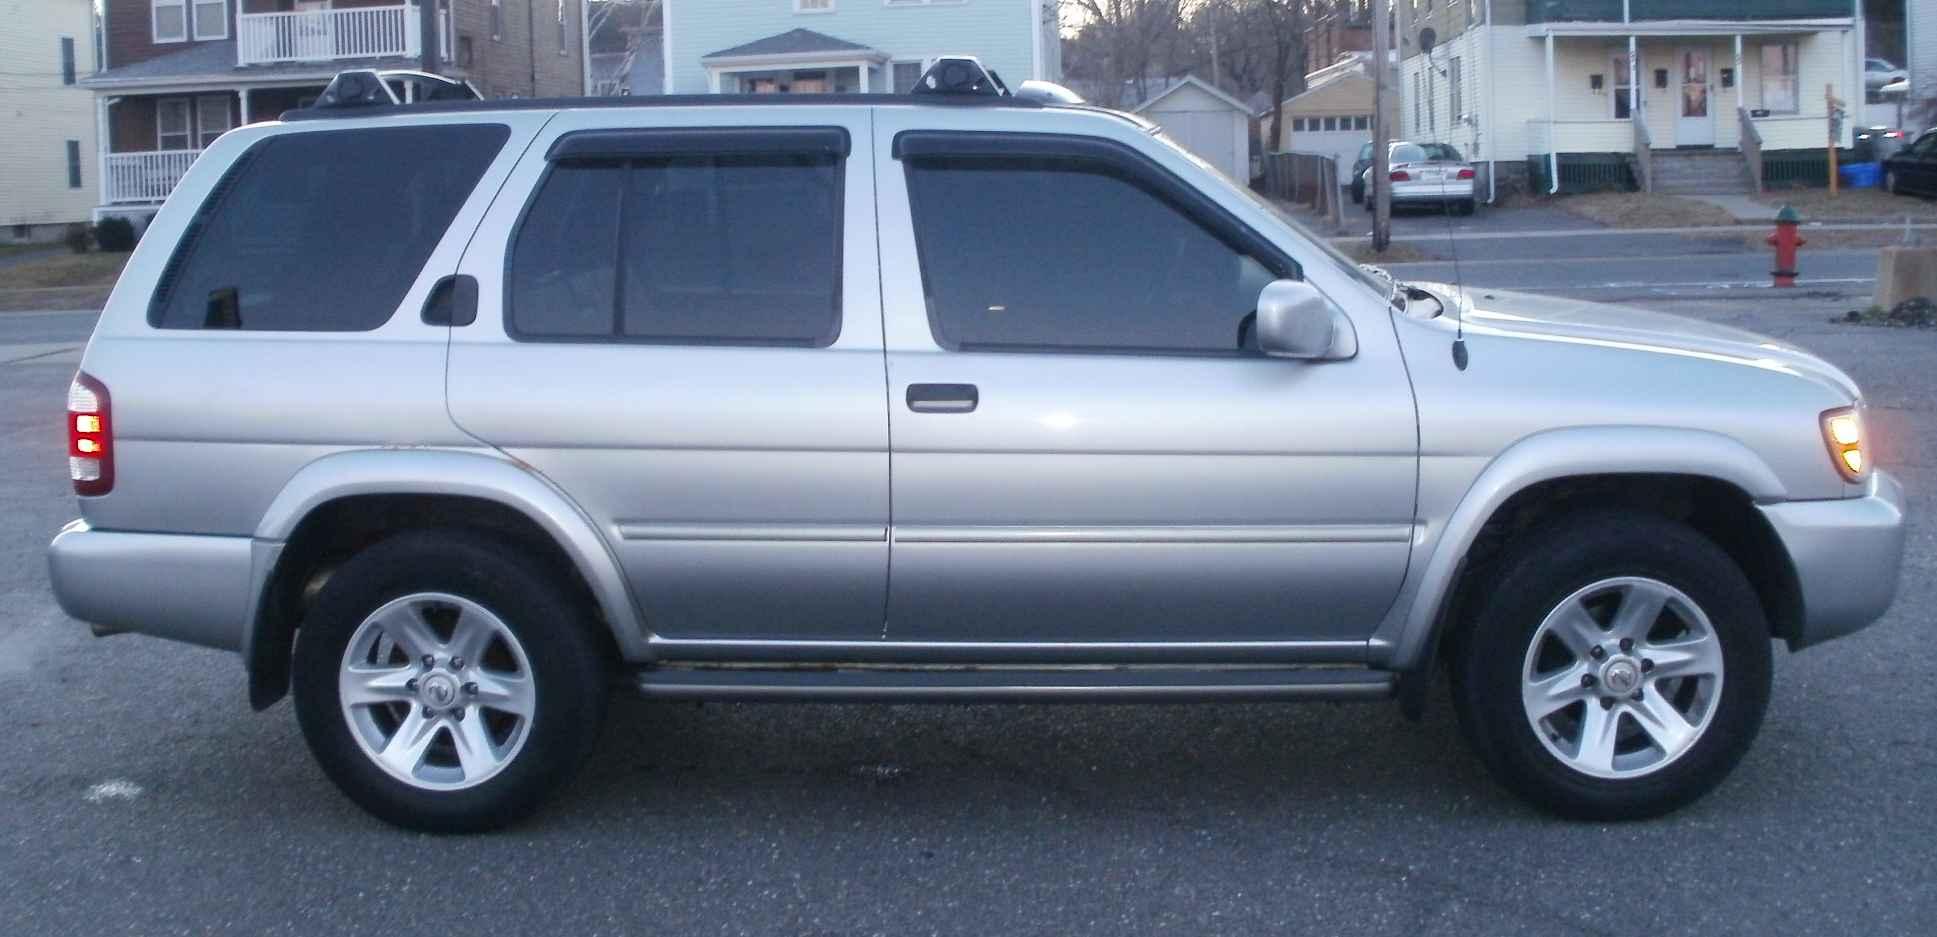 2002 Nissan Pathfinder Image 5